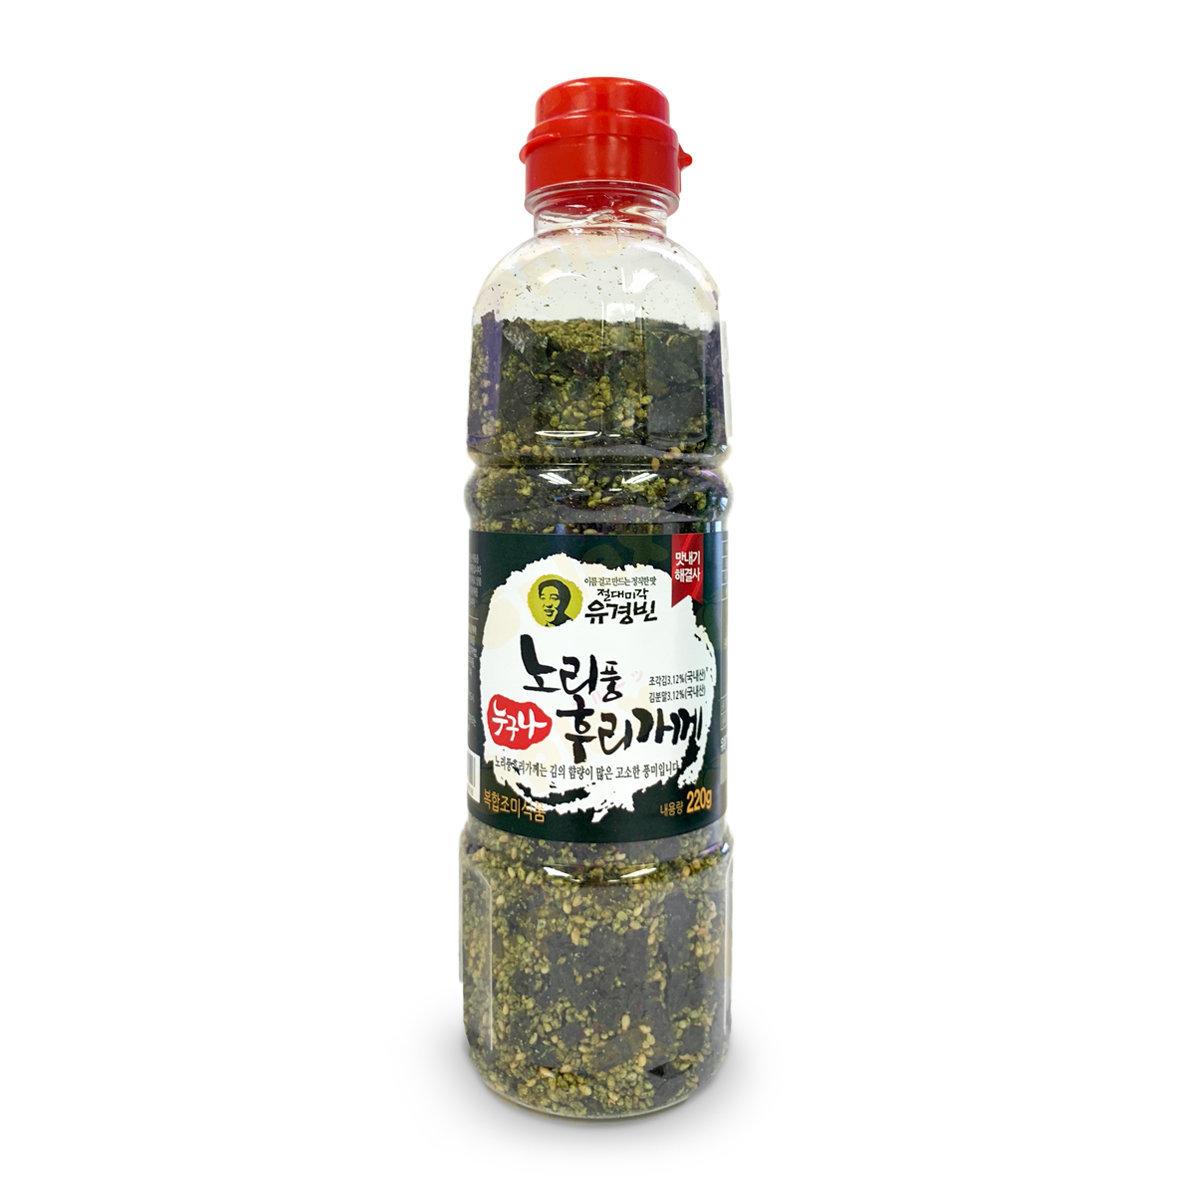 Fried Sesame Seaweed Rice Toppings/Furikake (220ml) (Green)